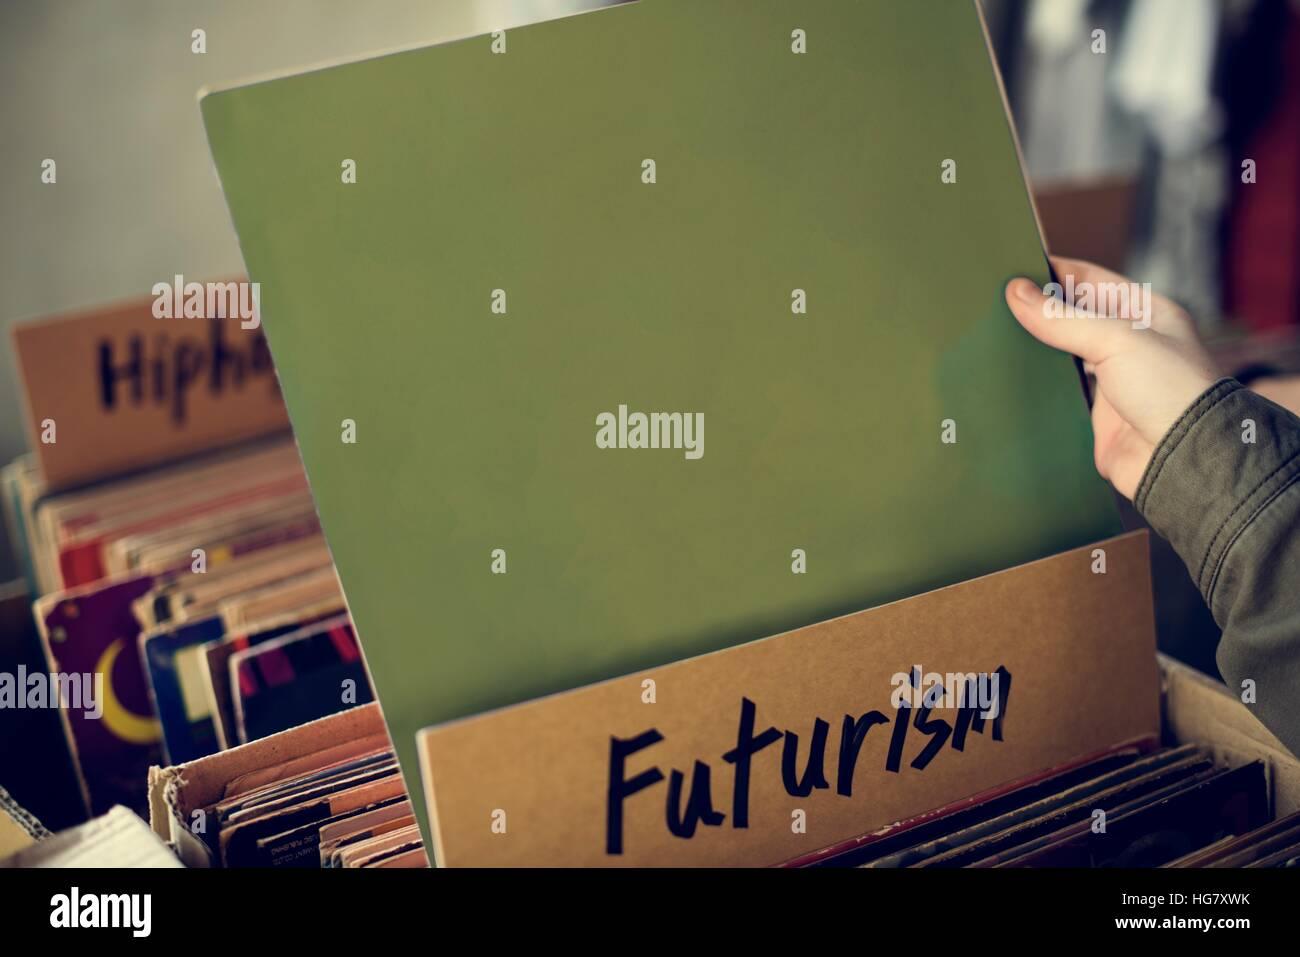 Futurism Music Audio Relaxation Rhythm Vinyl Concept Stock Photo ...